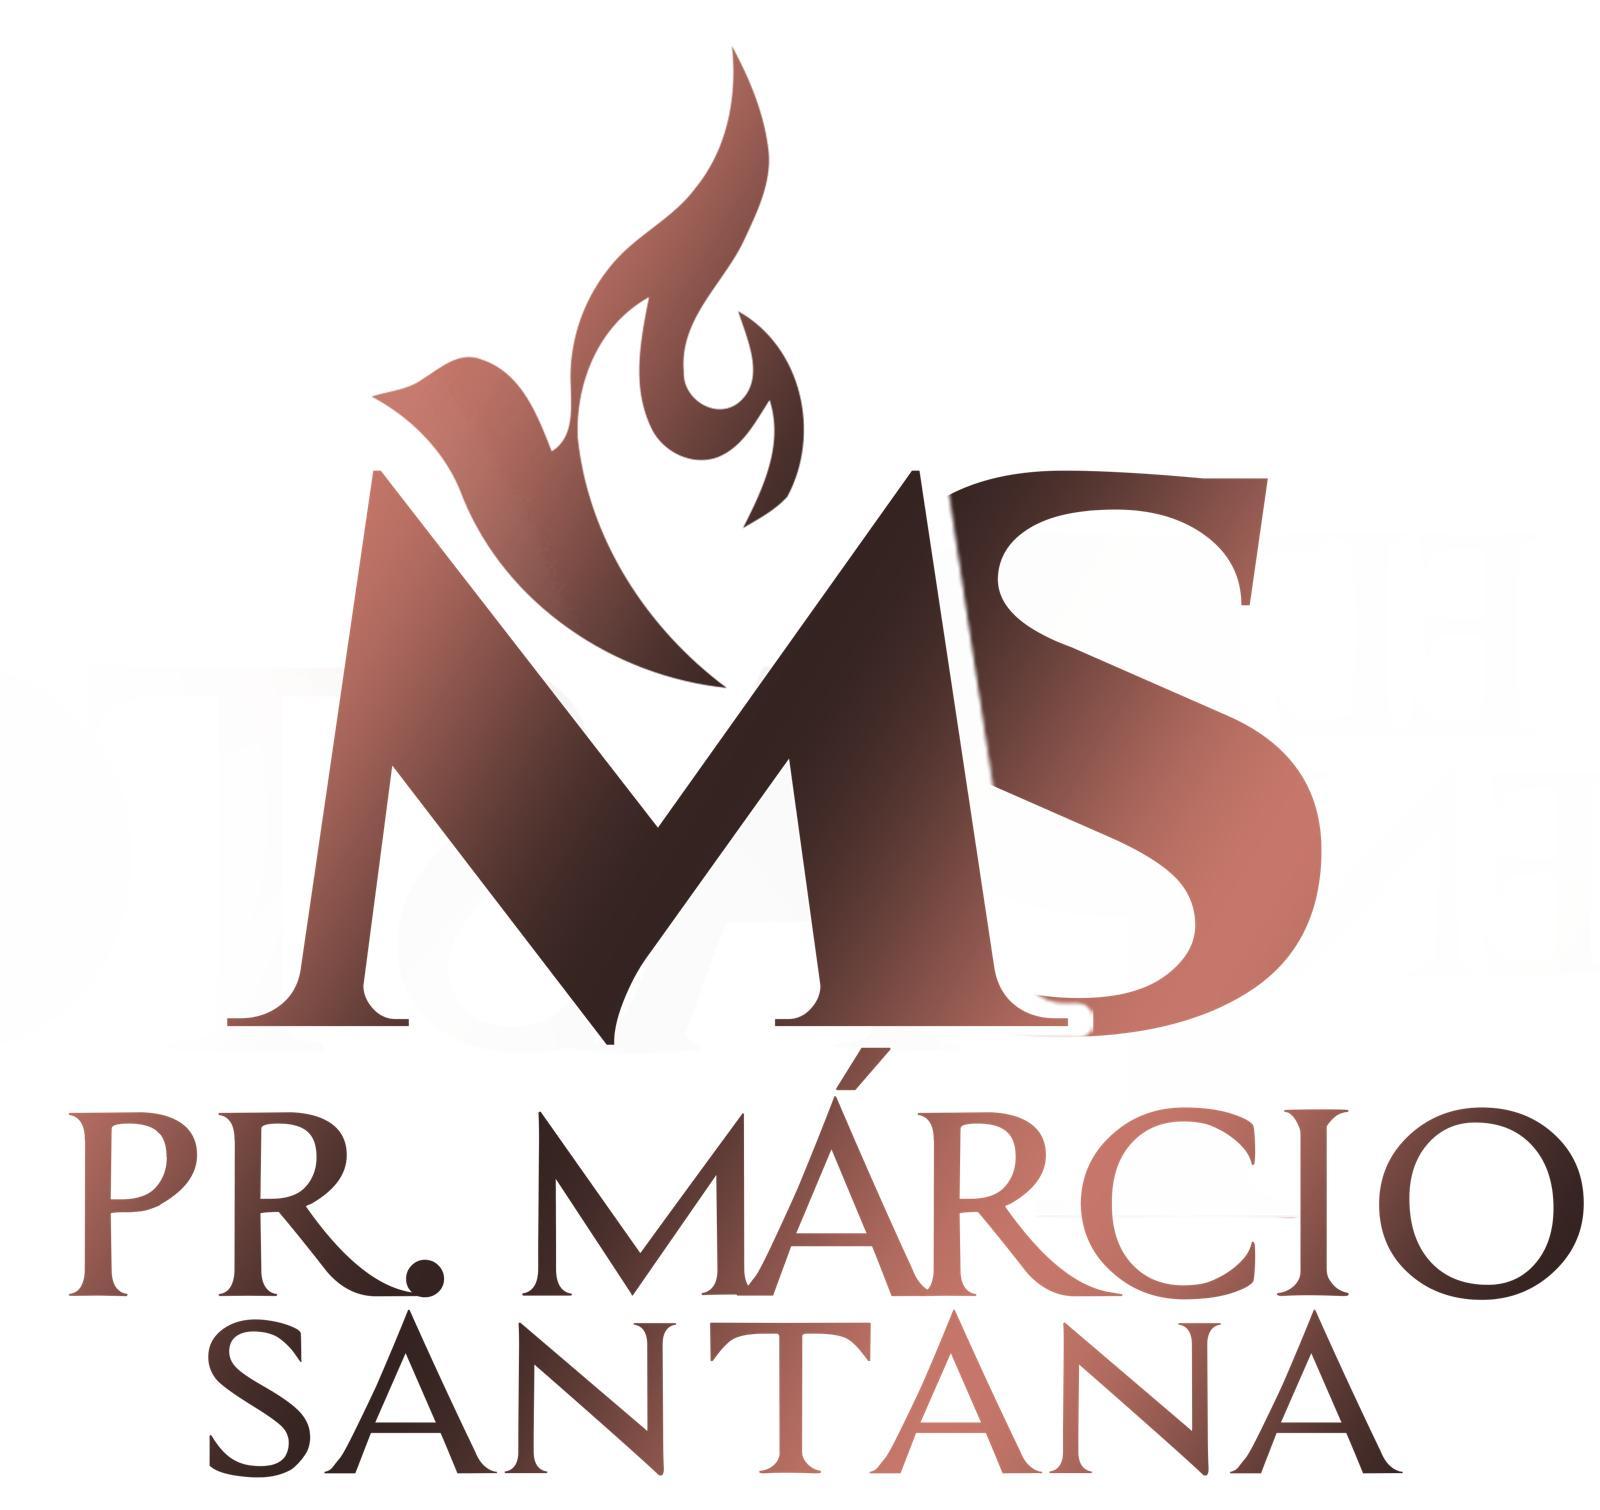 Pastor Márcio Santana